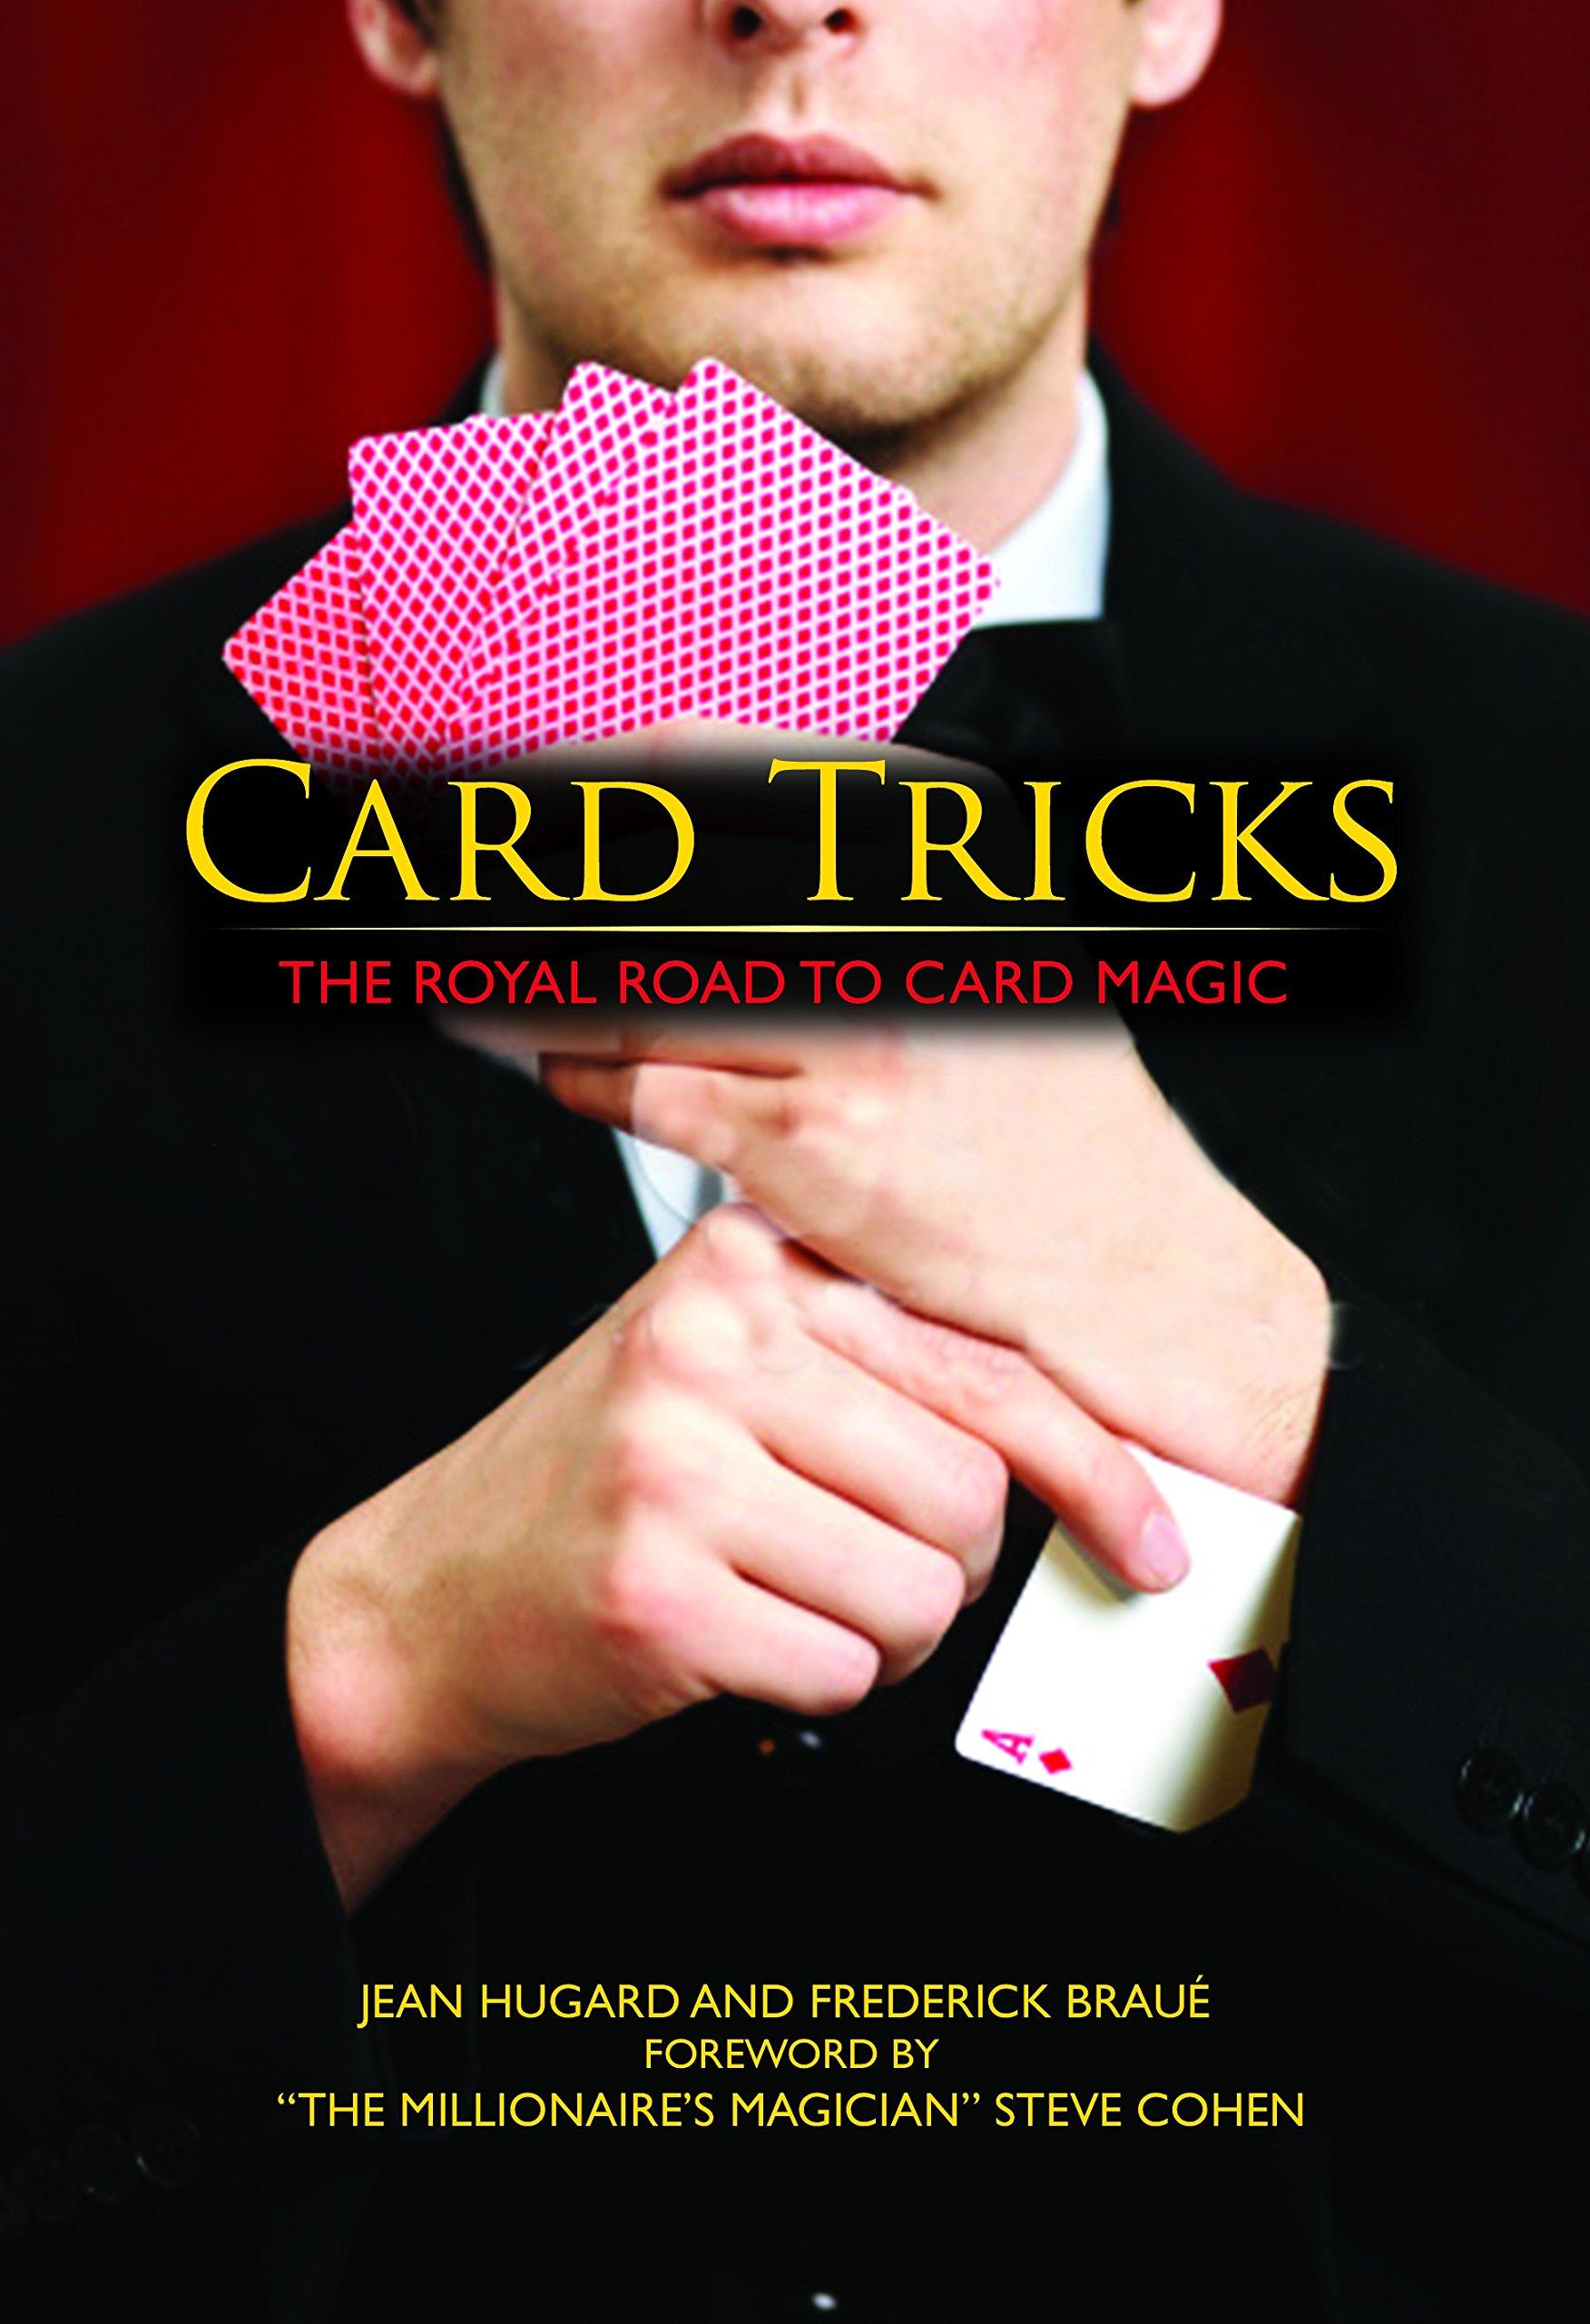 card-tricks-the-royal-road-to-card-magic